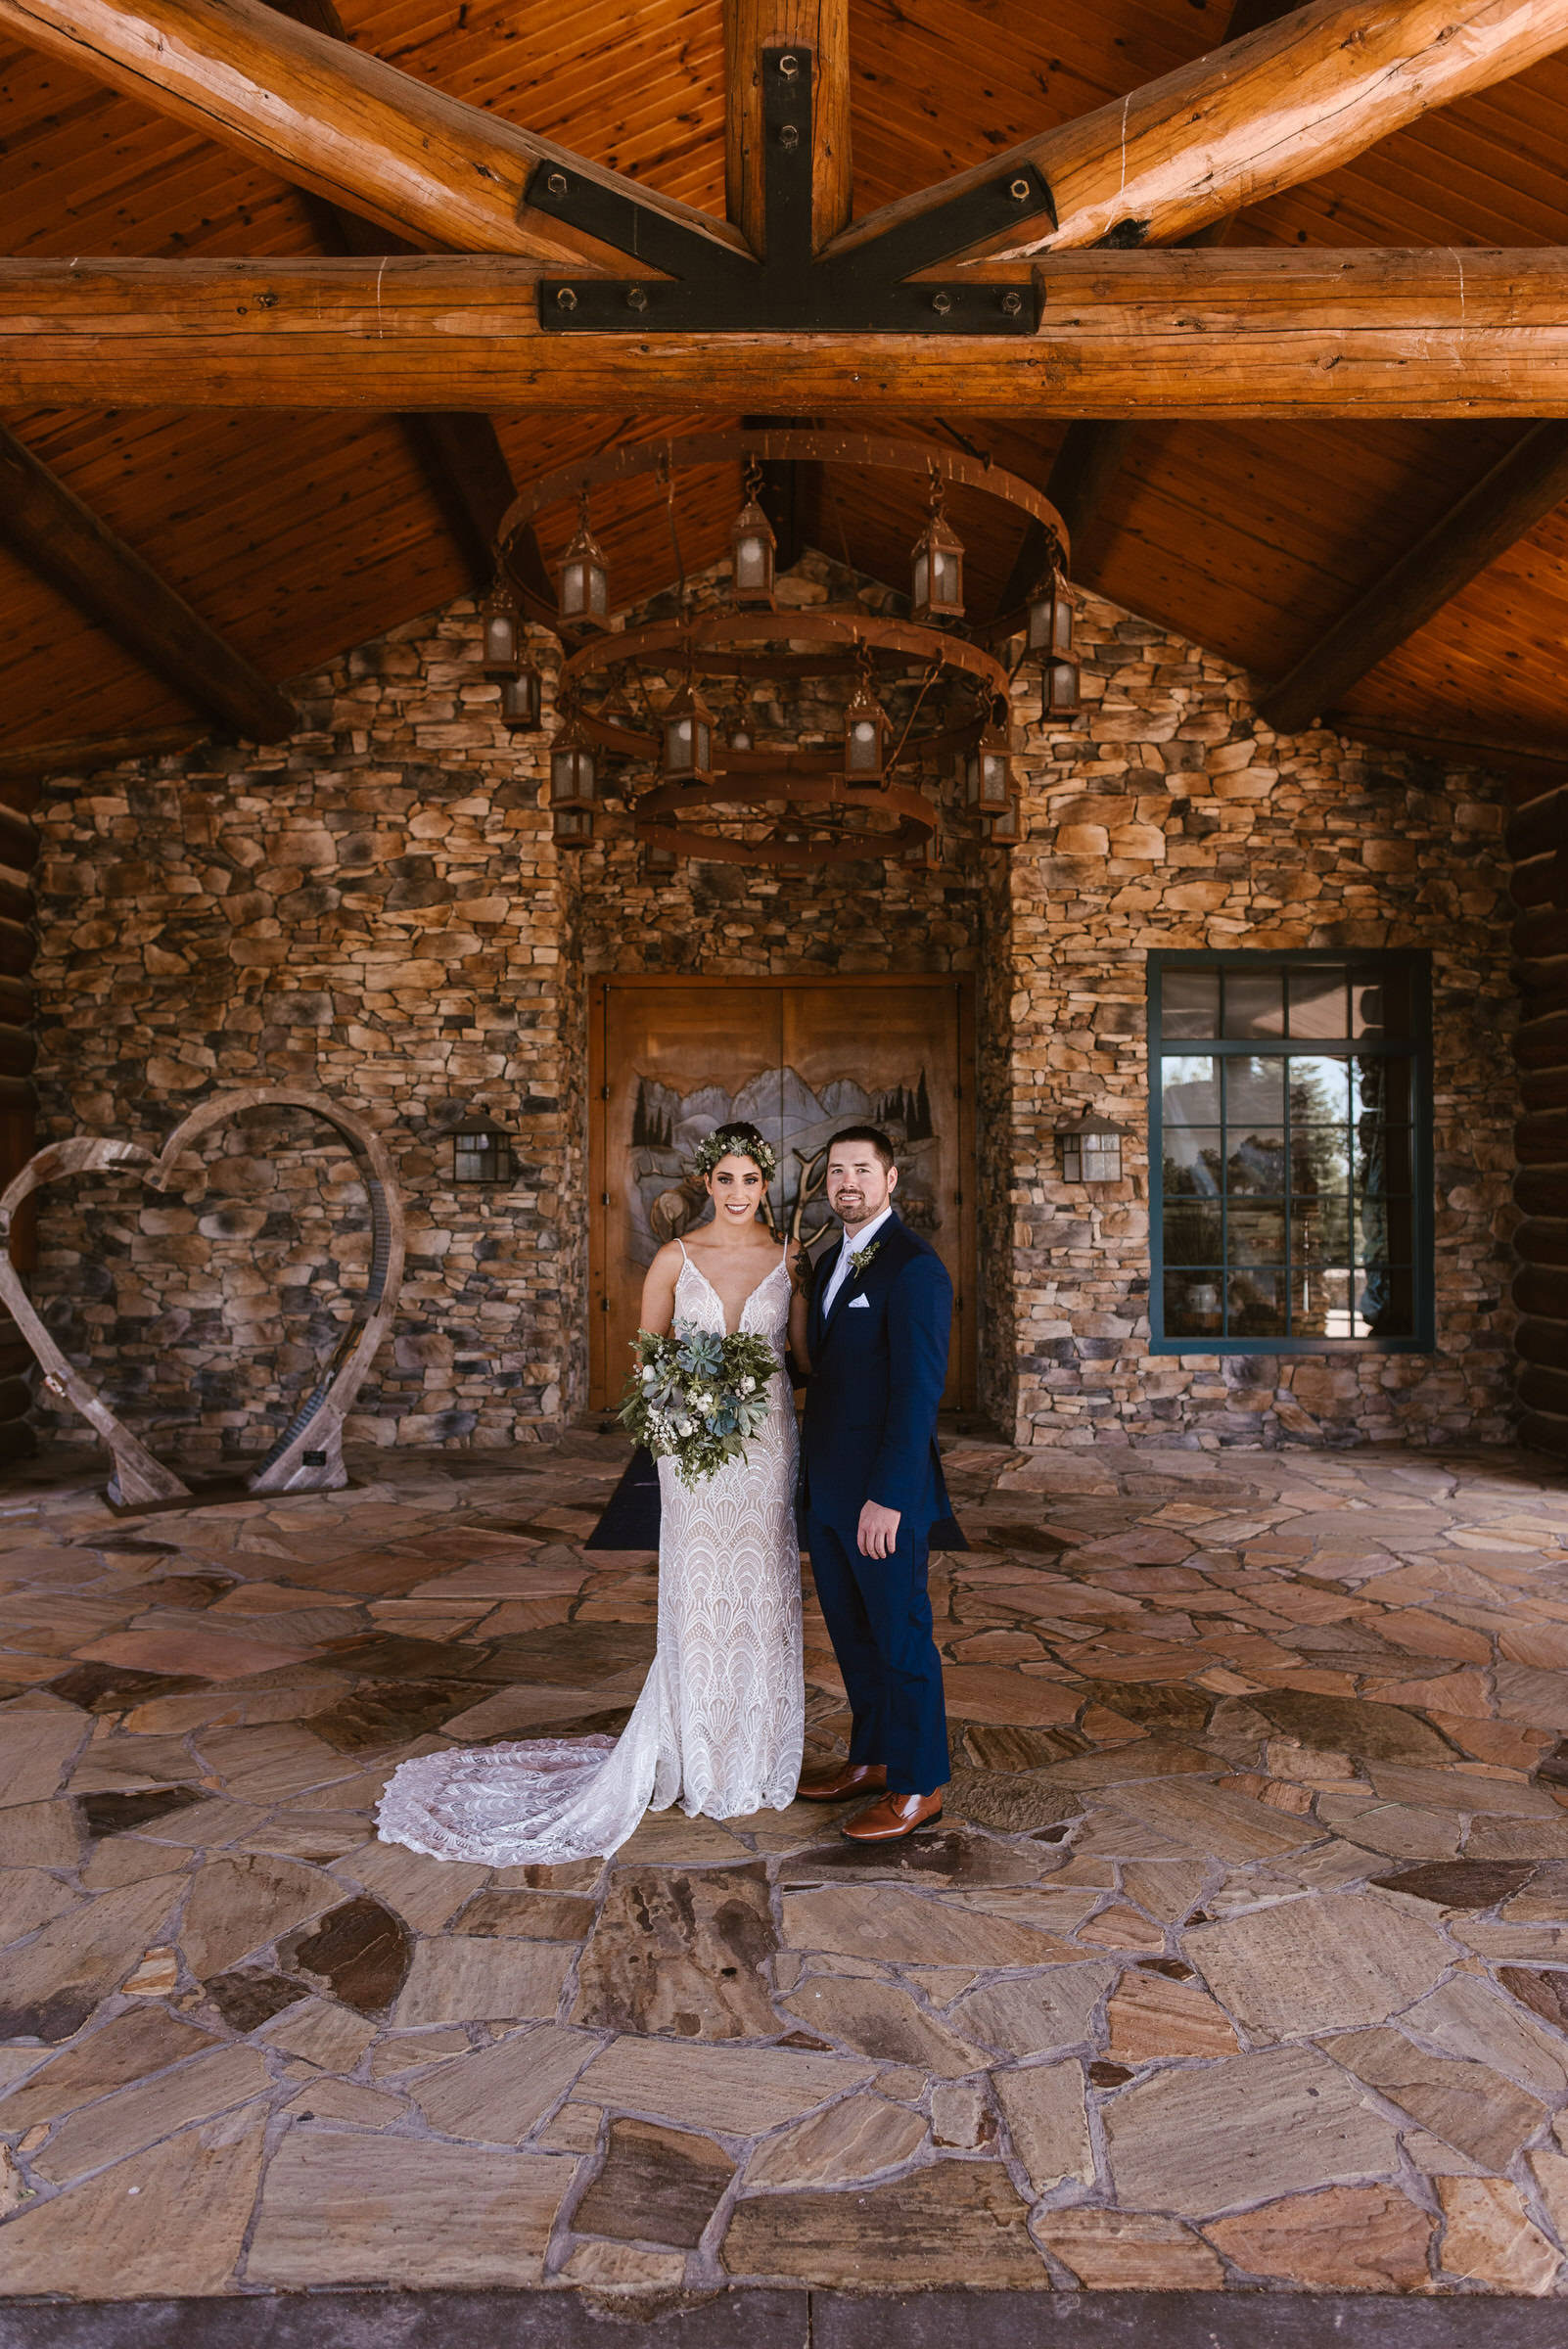 Wilderness-Ridge-Lincoln-Nebraska-Wedding-Kaylie-Sirek-Photography-030.jpg